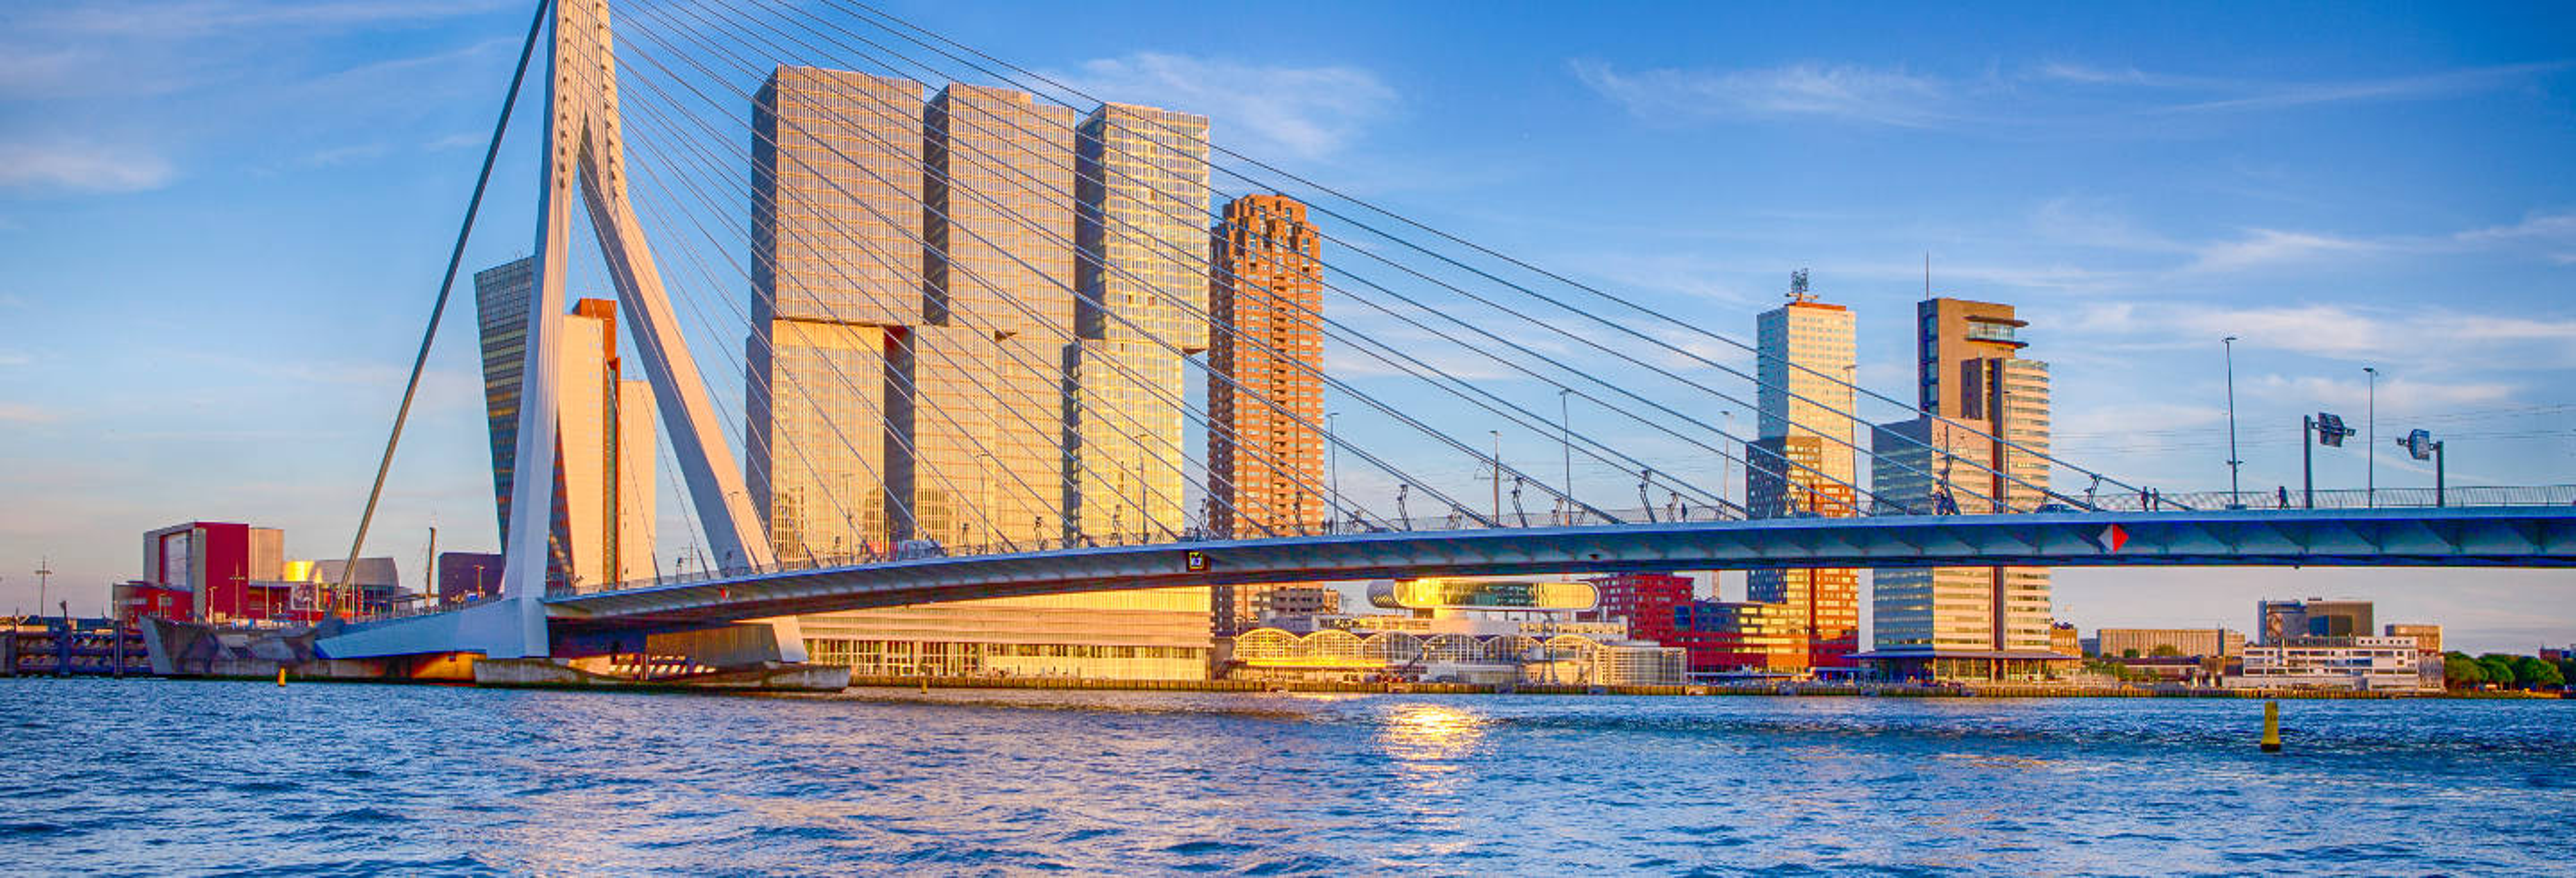 Private Tour of Rotterdam